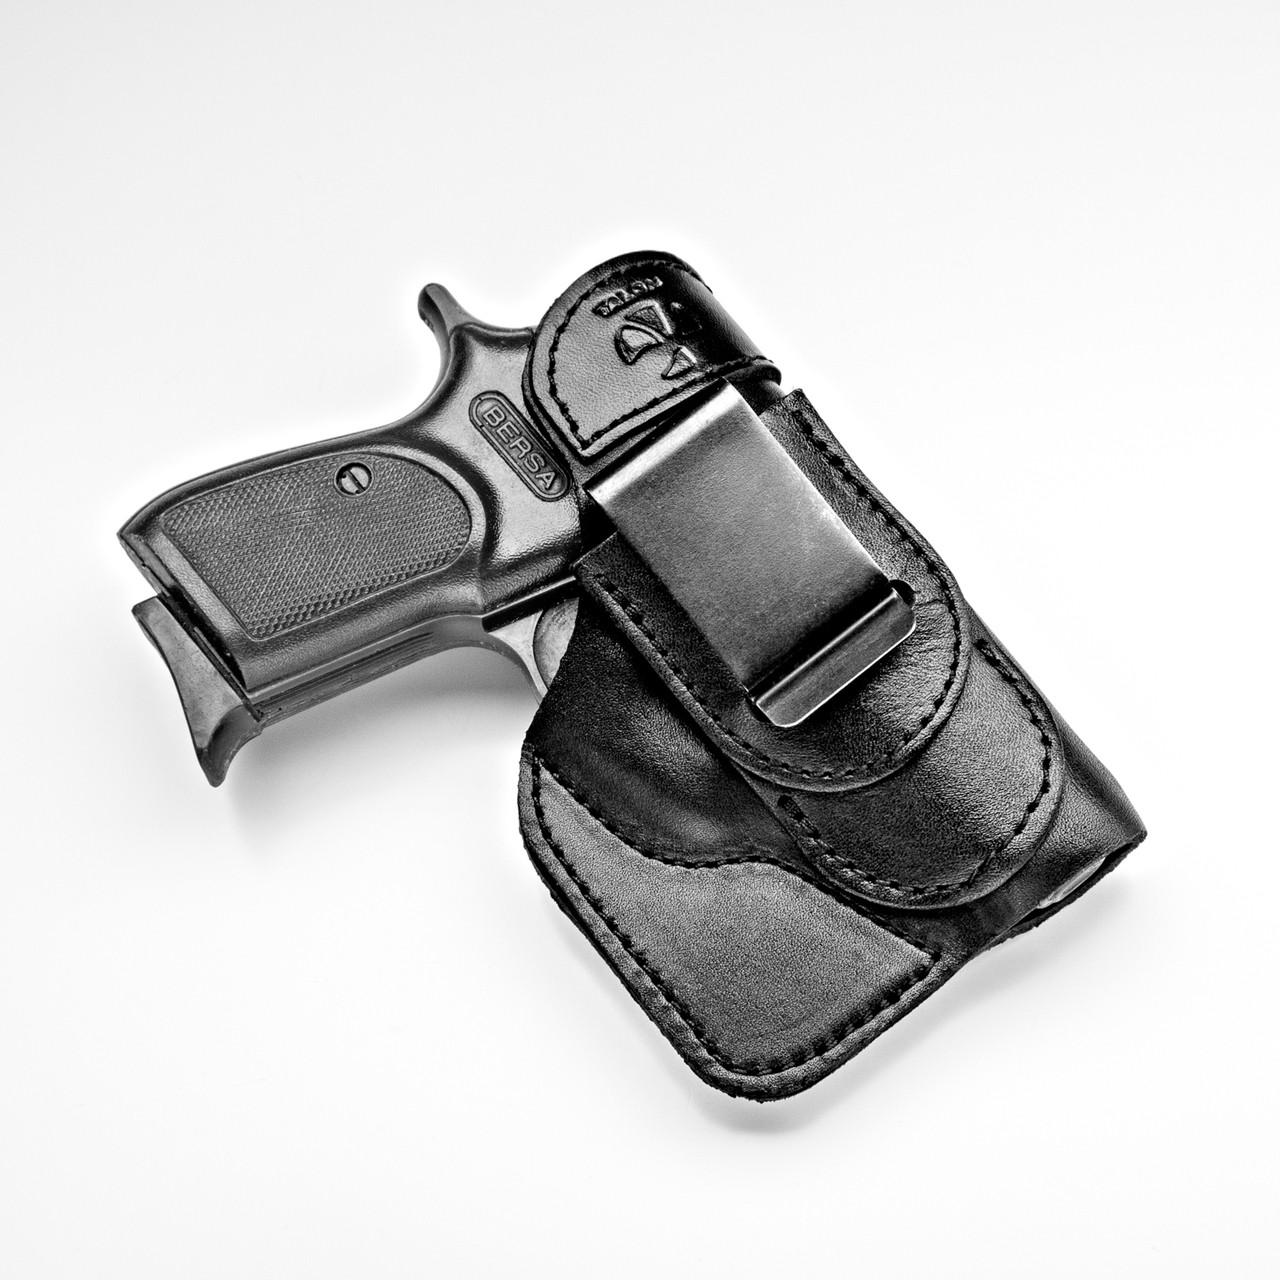 Talon Tuckable Bersa Thunder/Walther PP IWB Holster